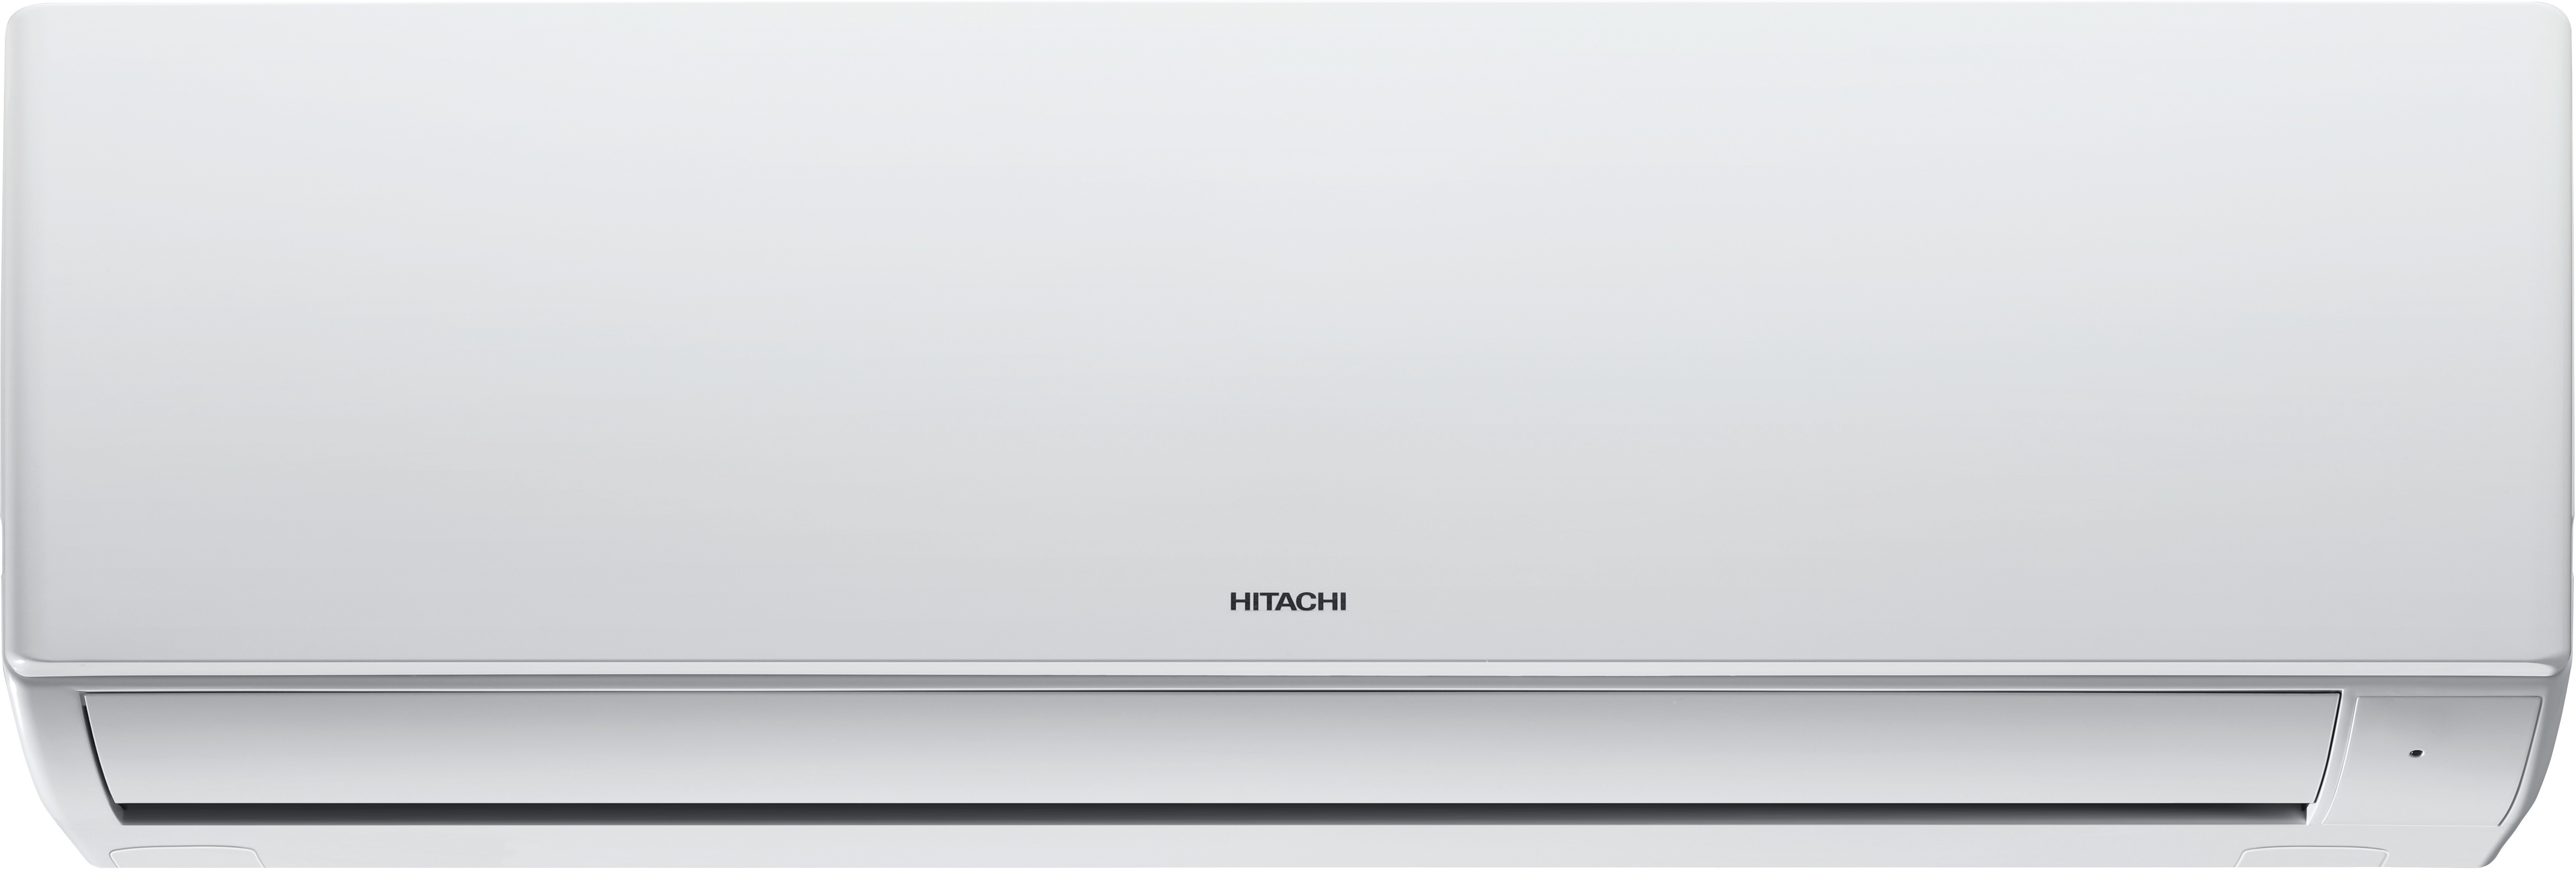 Hitachi 1 Ton 5 Star Split AC  - White(RSZ512HAD, Copper Condenser) (Hitachi)  Buy Online